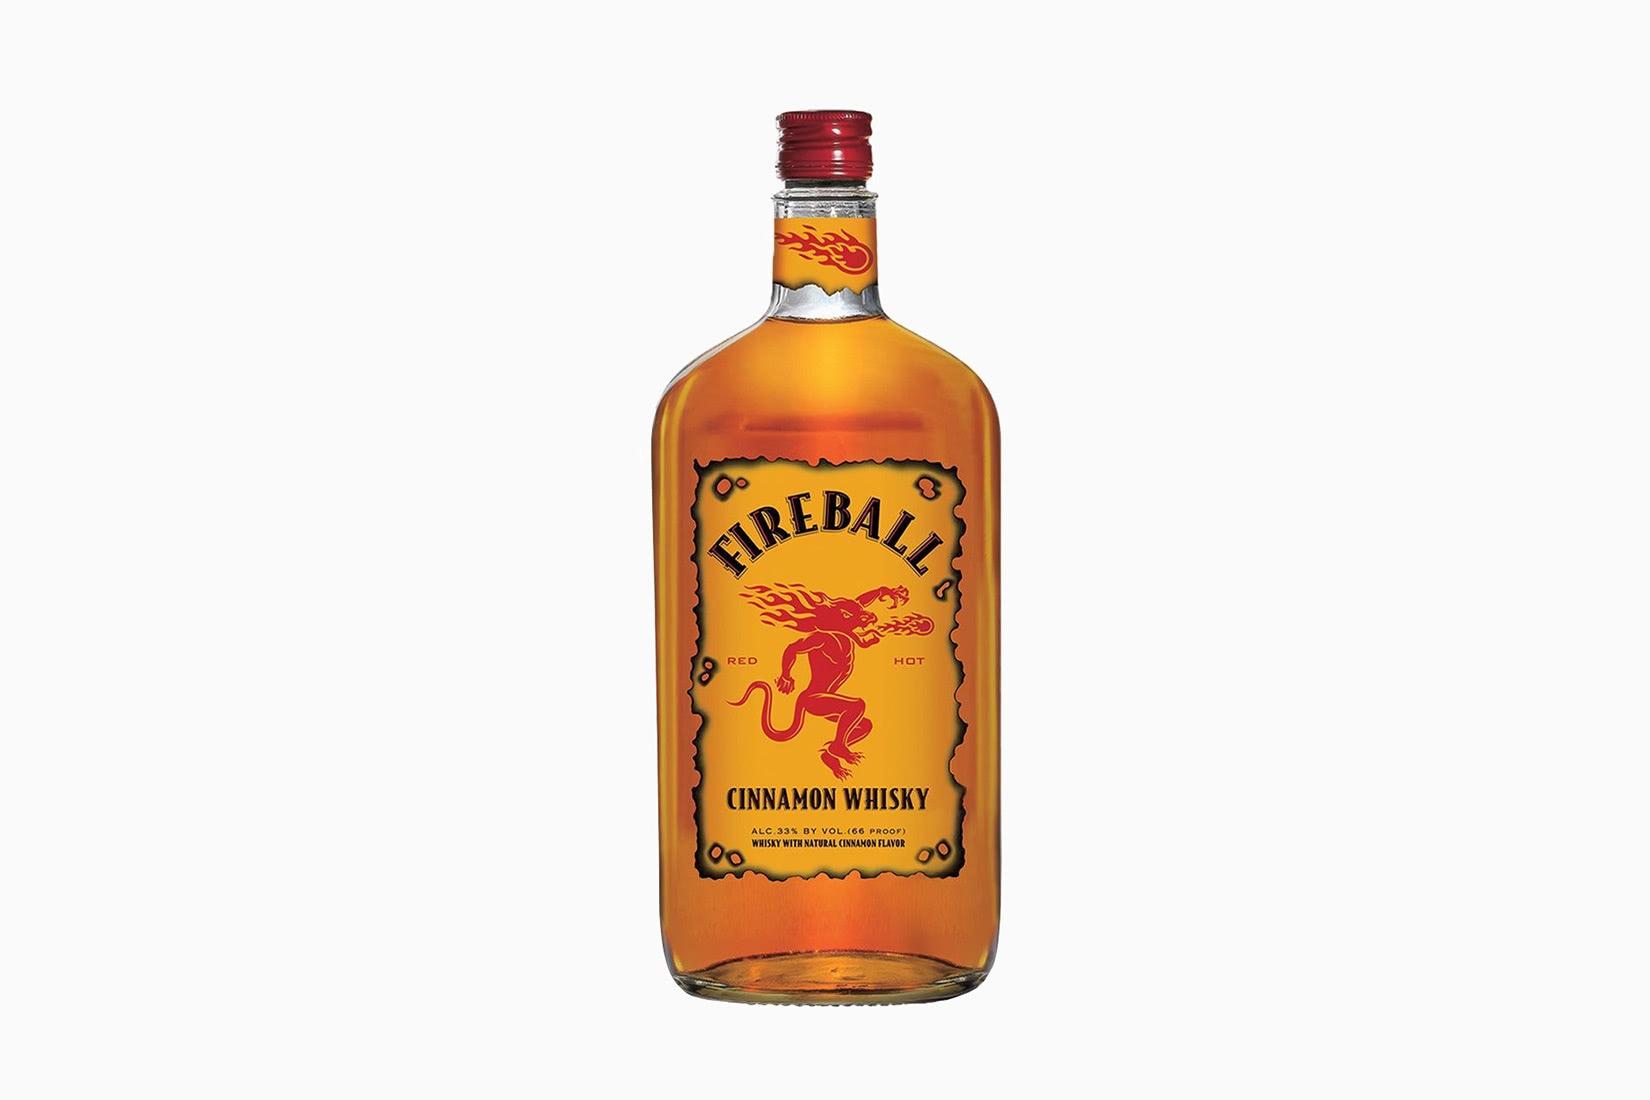 tamaño de precio de botella de whisky canela bola de fuego - Luxe Digital